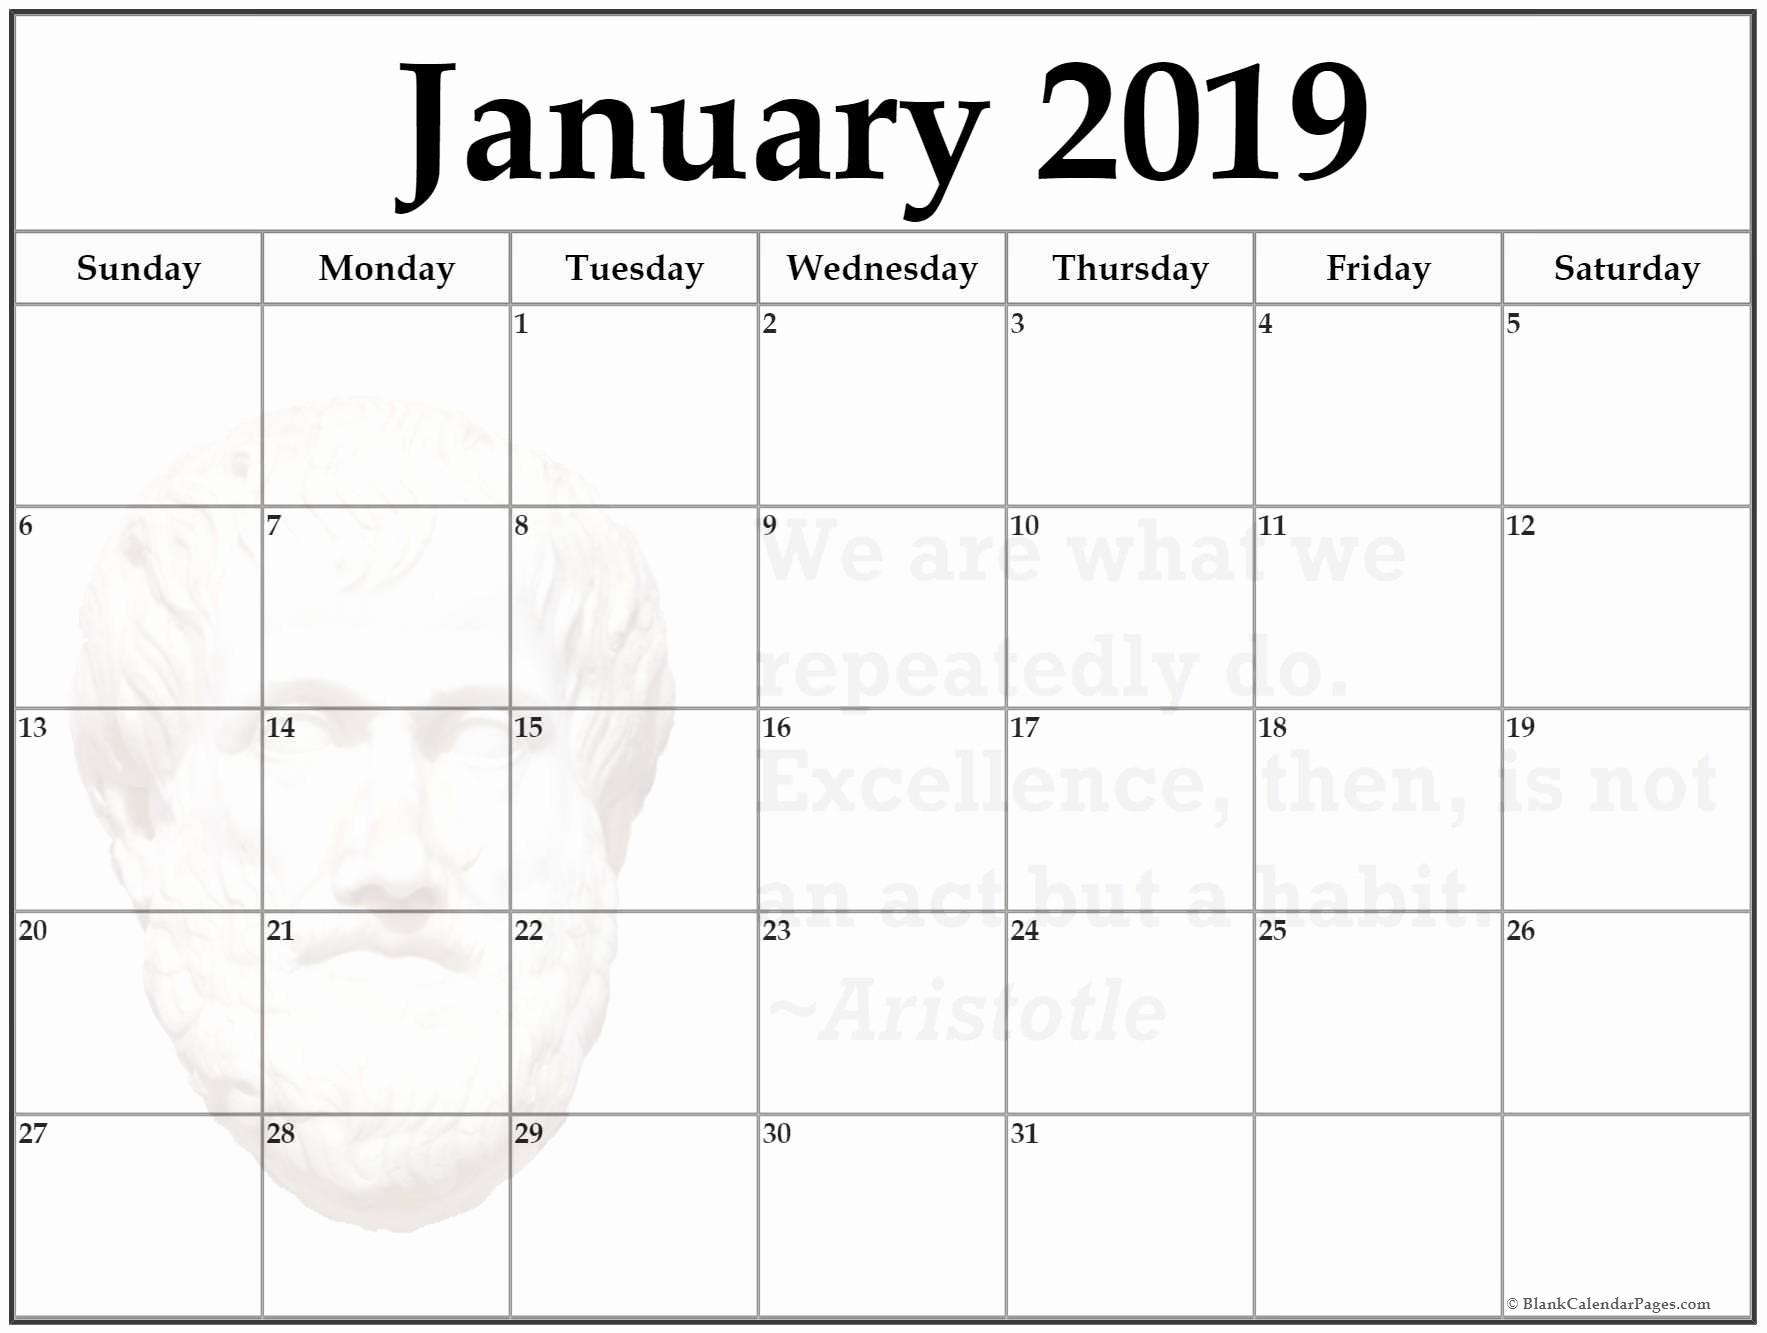 March Calendar Canada Actual January 2019 Calendars Canada Lara Expolicenciaslatam Of March Calendar Canada Más Arriba-a-fecha Kalender Ausdrucken 2015 Schön Printable 0d Calendars Kalender